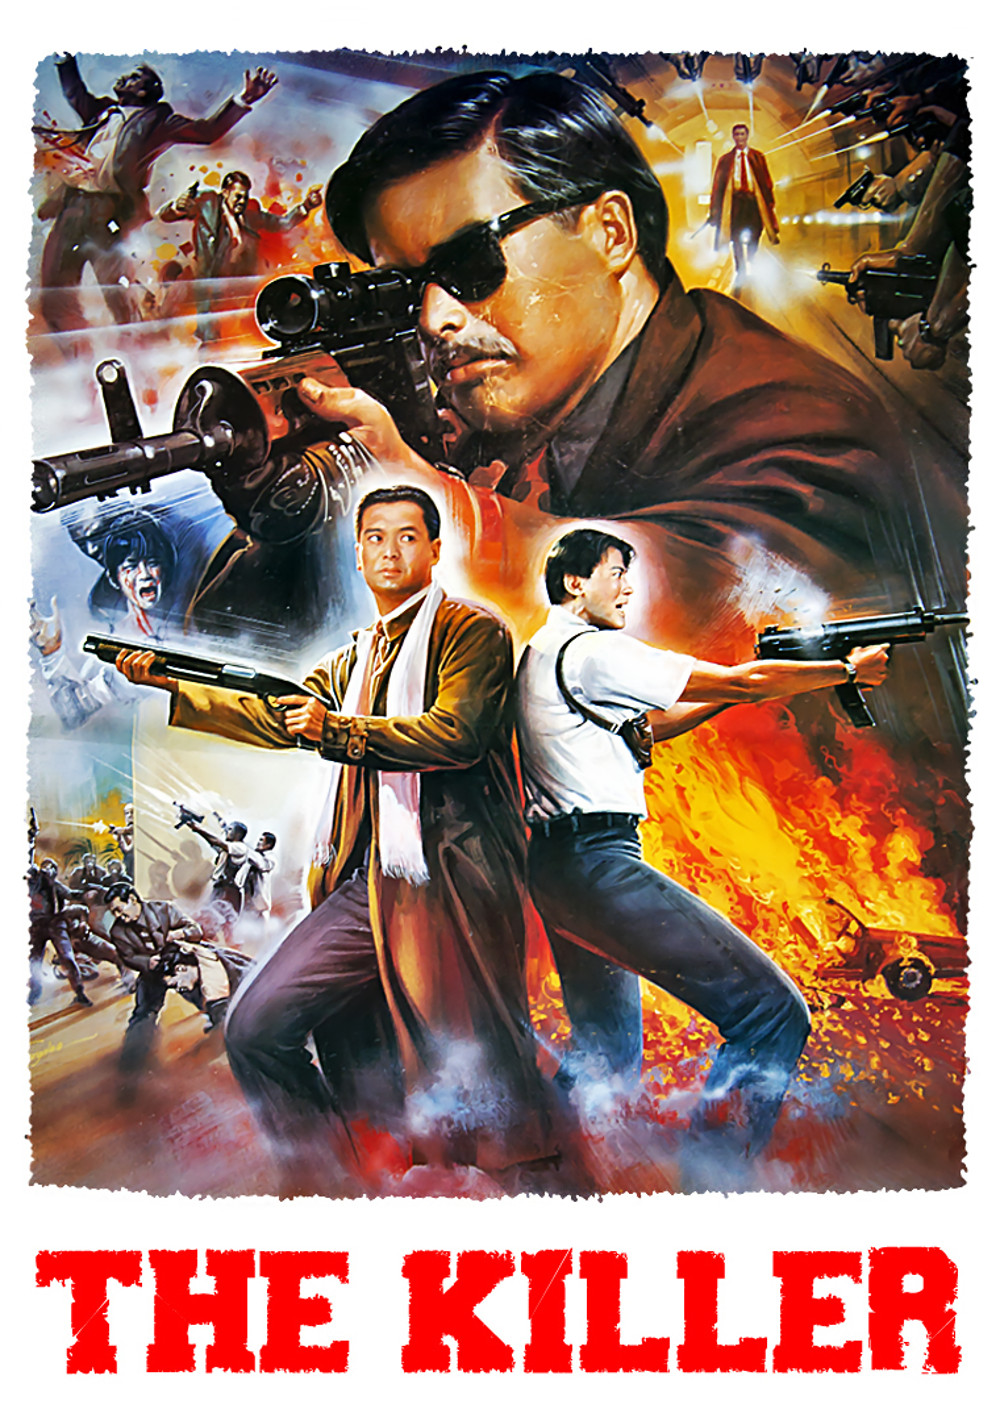 Killers Film